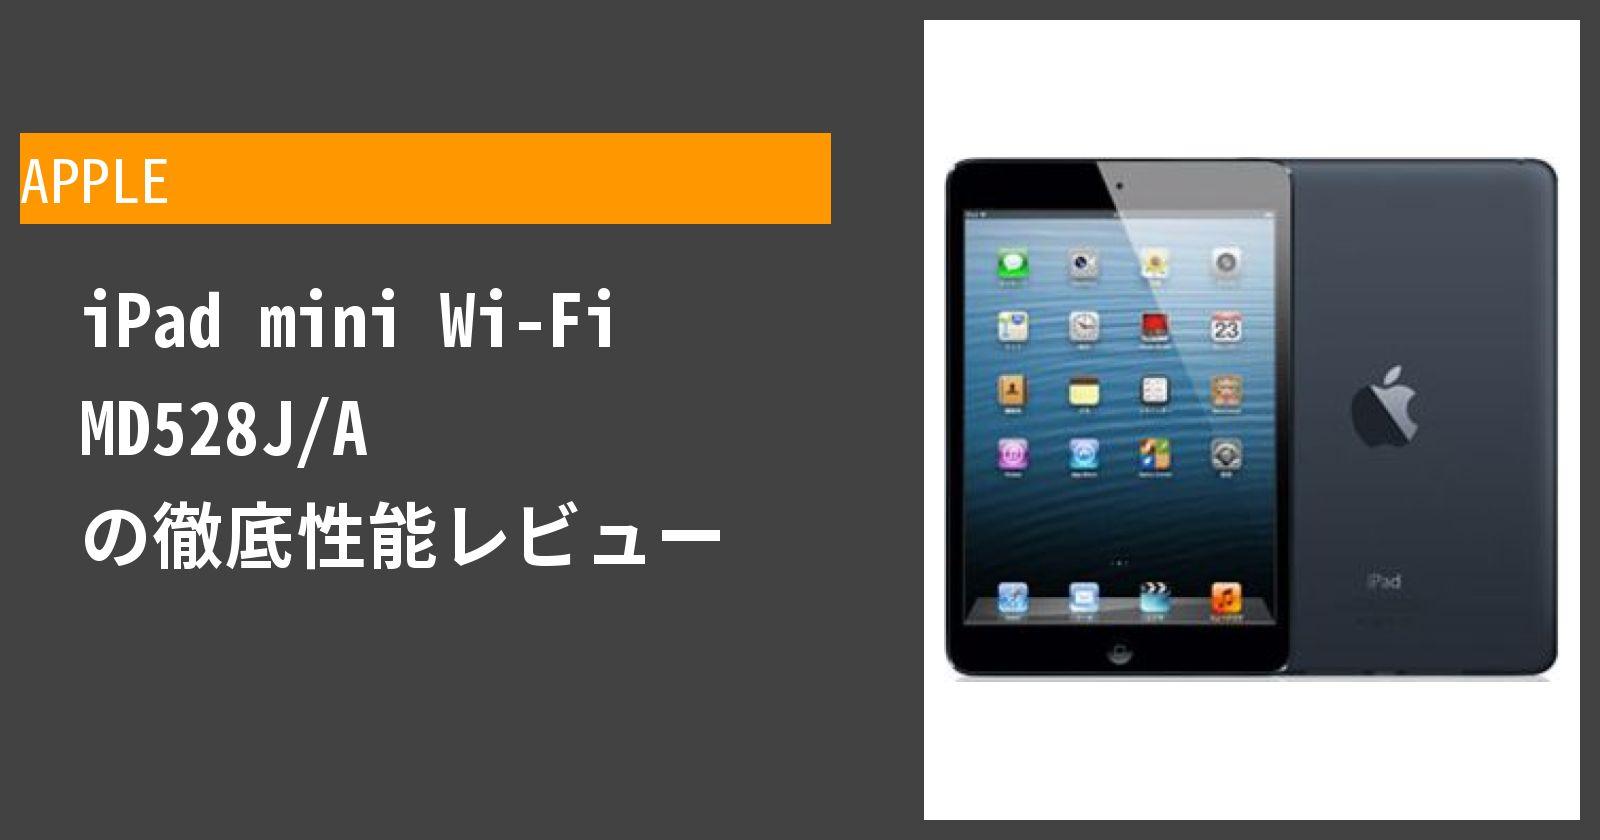 iPad mini Wi-Fi MD528J/A の徹底性能レビュー